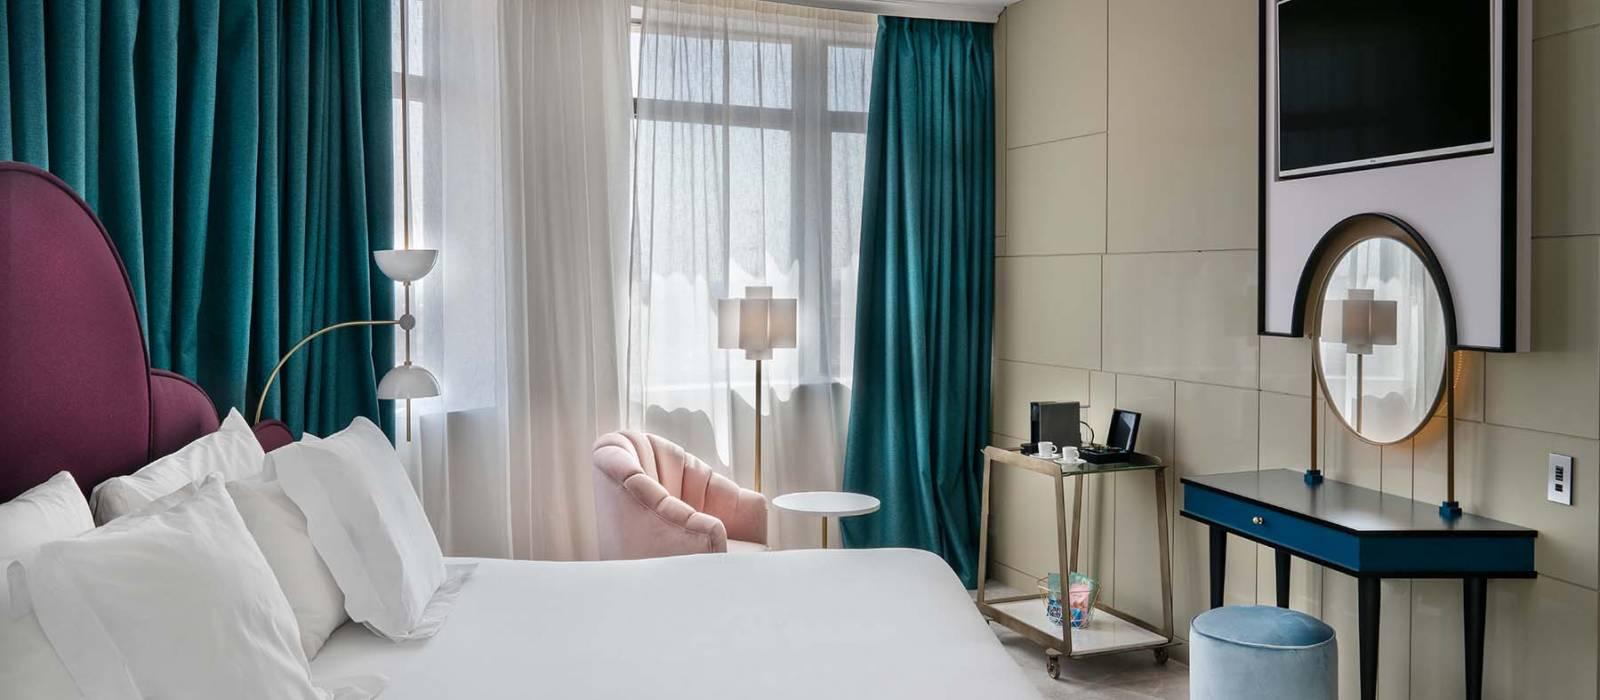 Rooms Hotel Vinnci Madrid Capitol - Vincci Hoteles - Deluxe Panorámica Gran Vía